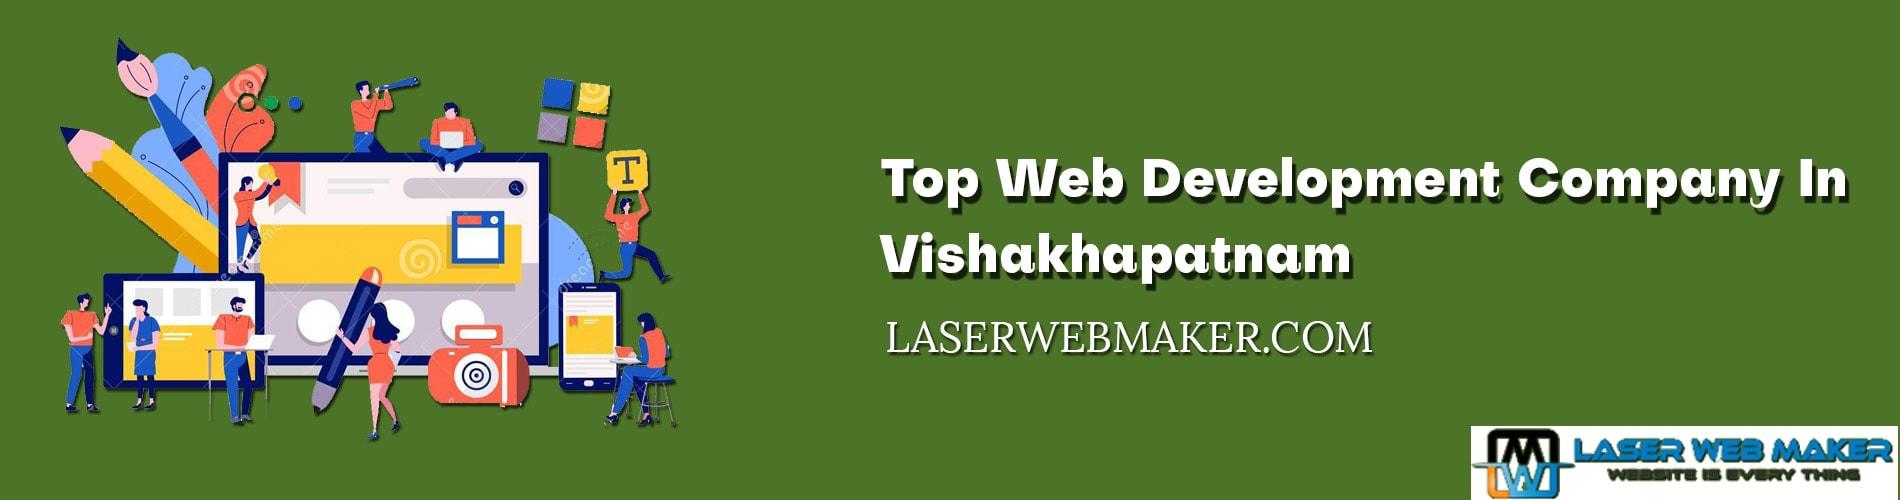 Top Web Development Company In Vishakhapatnam